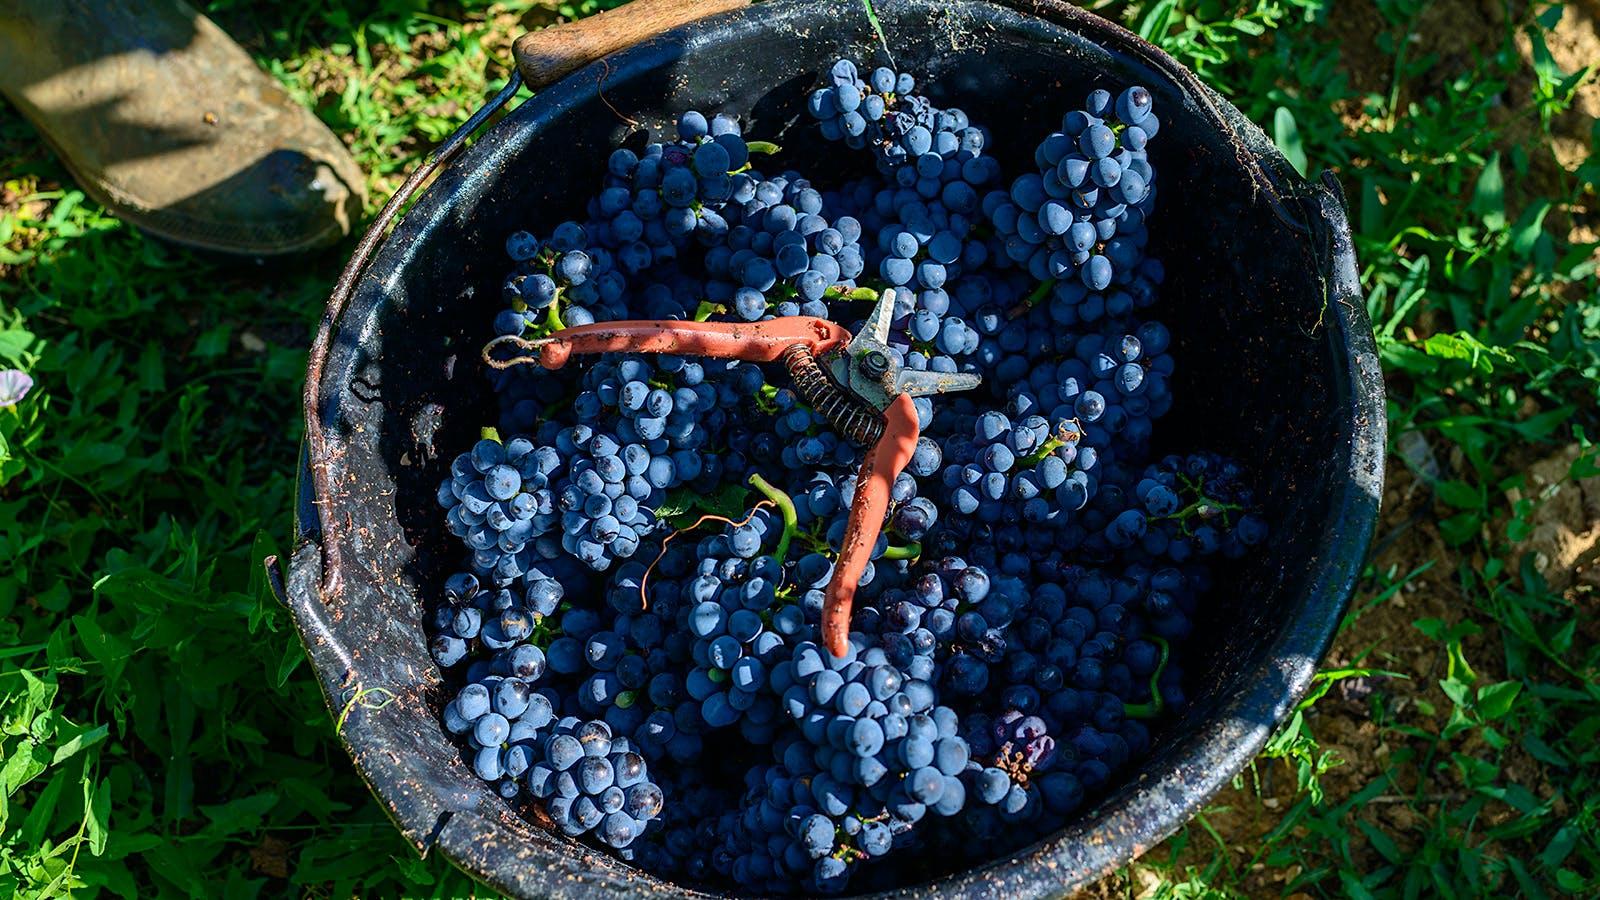 Wine Harvest 2015: Burgundy Winemakers Report Great Wines, but Low Quantities